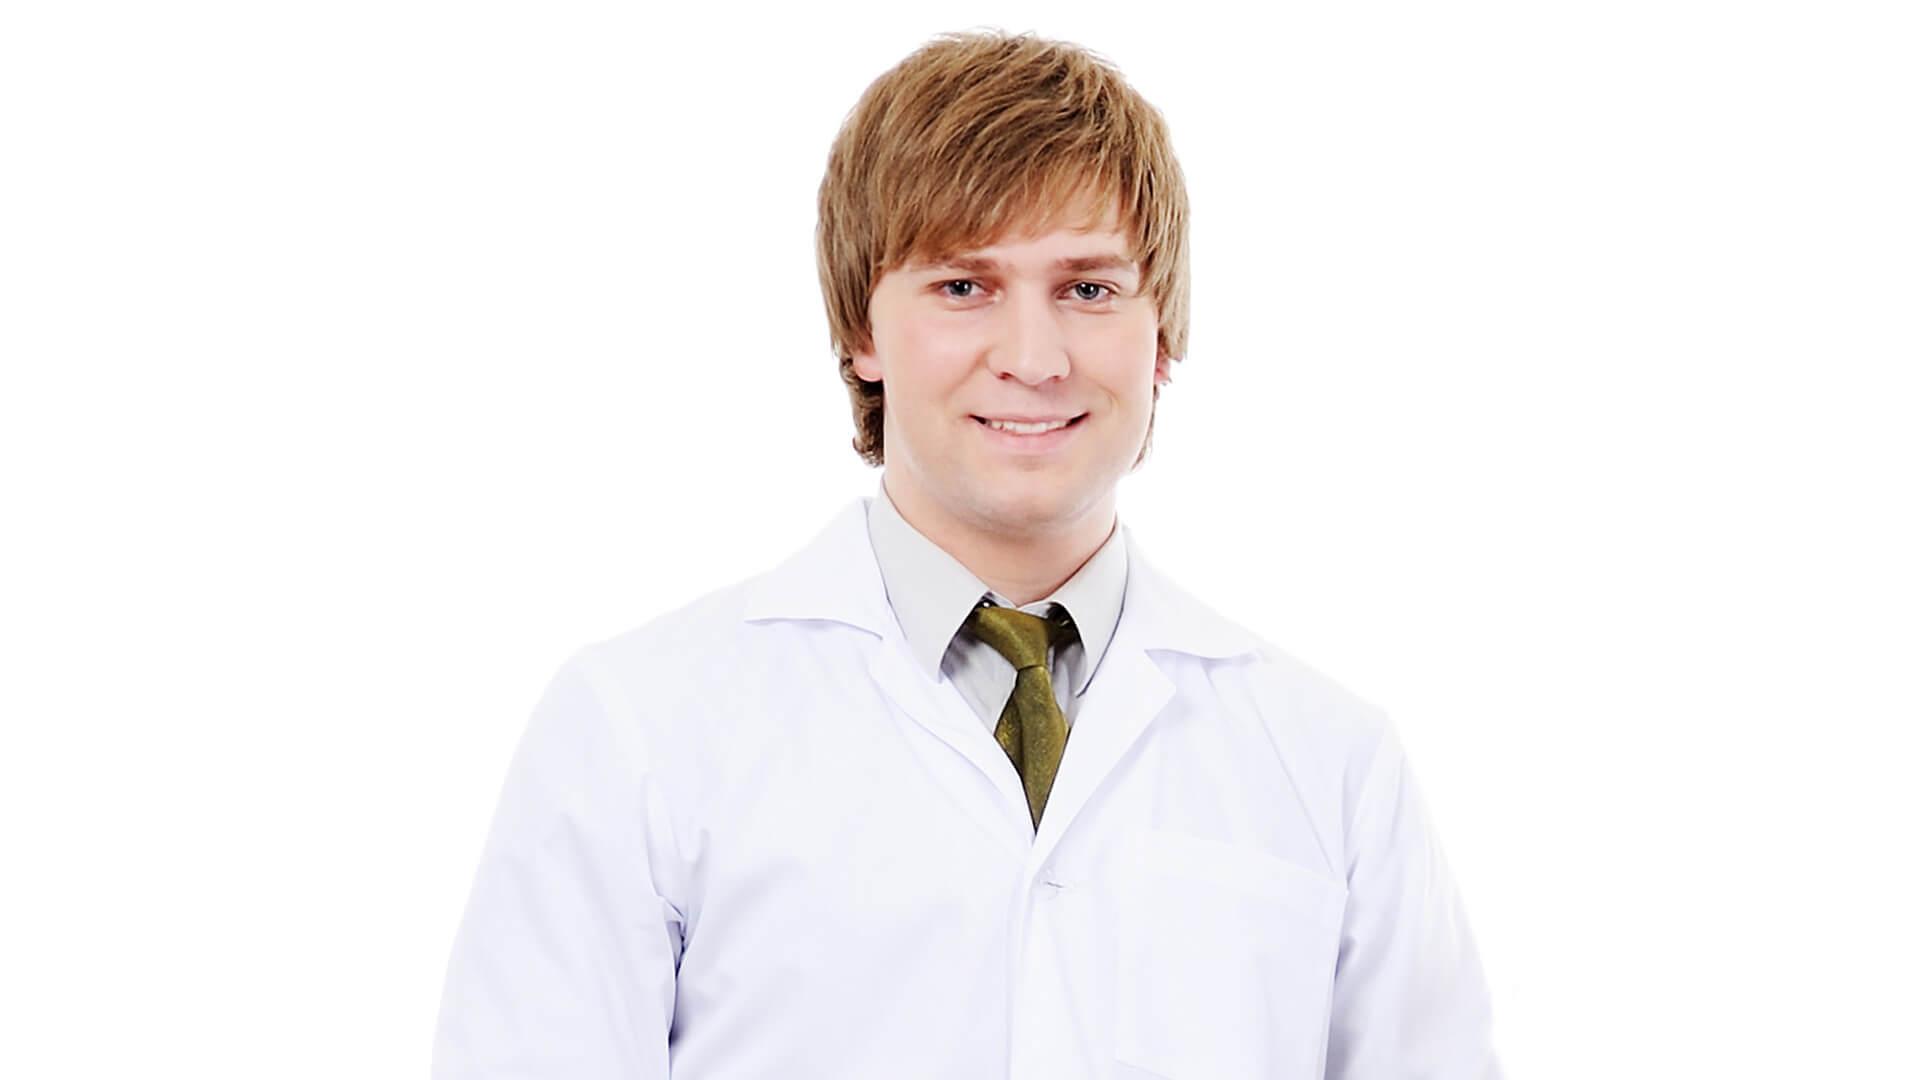 Dr. John Peterson